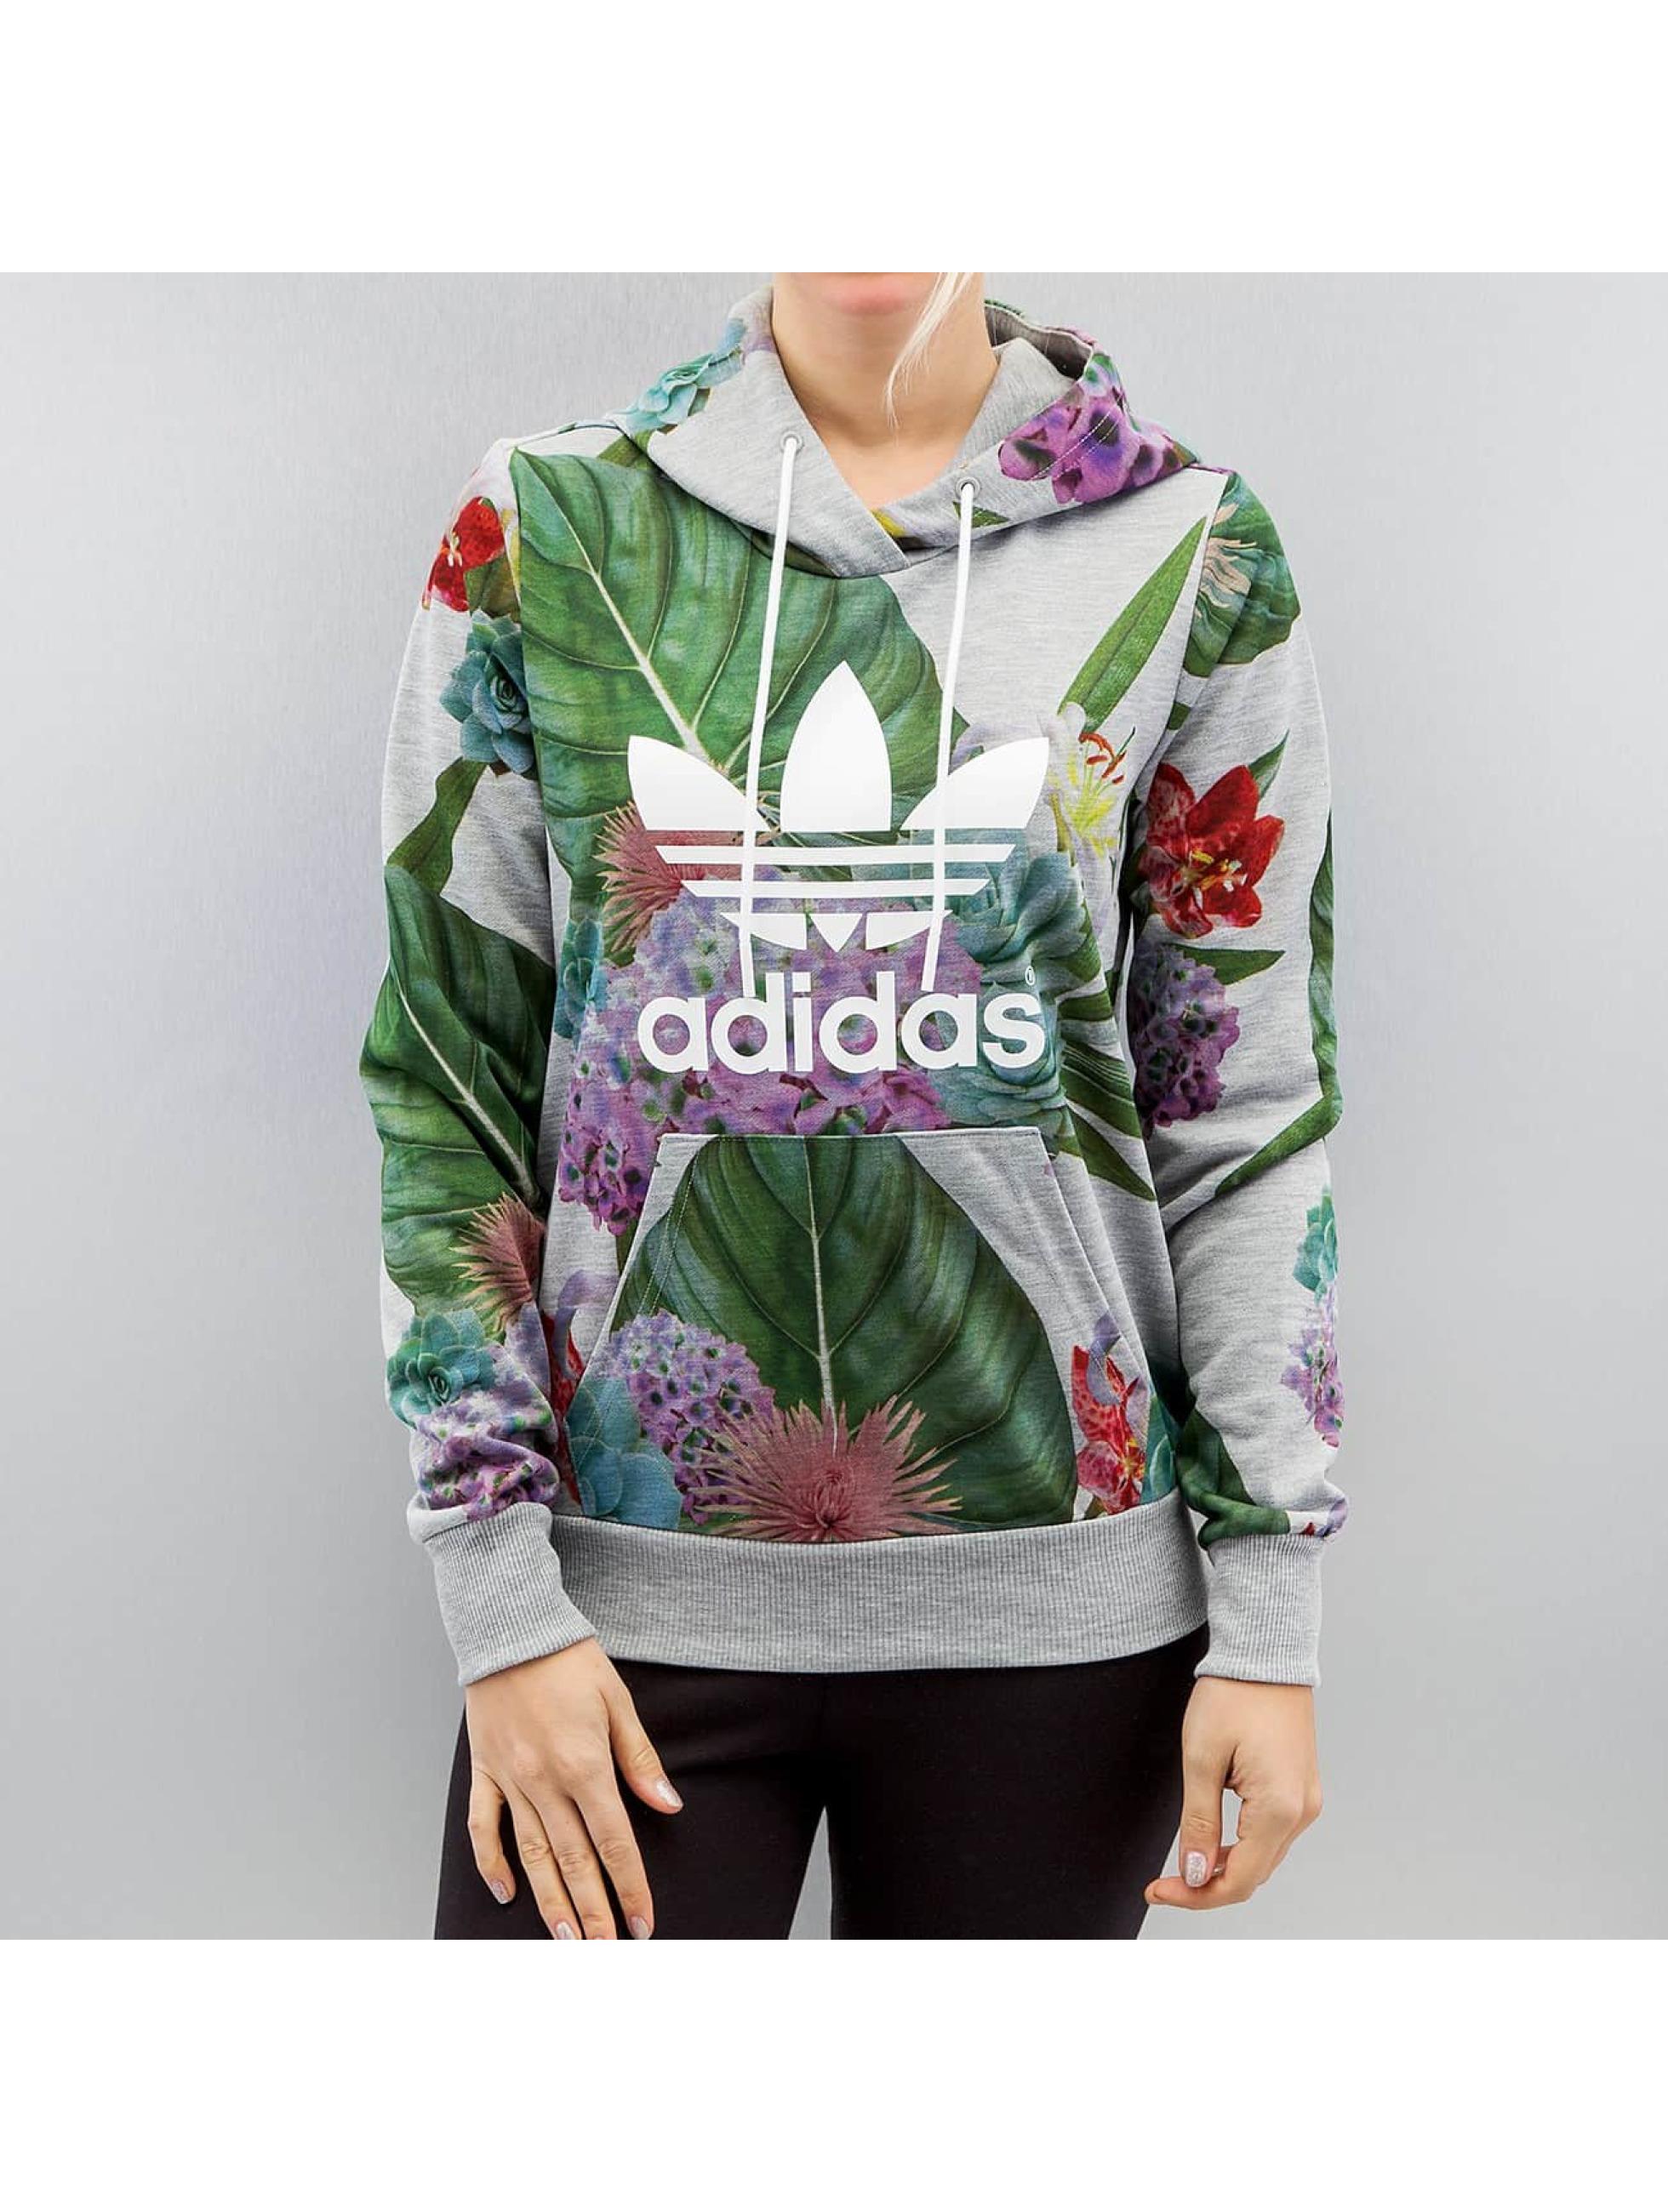 adidas sweatshirt damen bunt